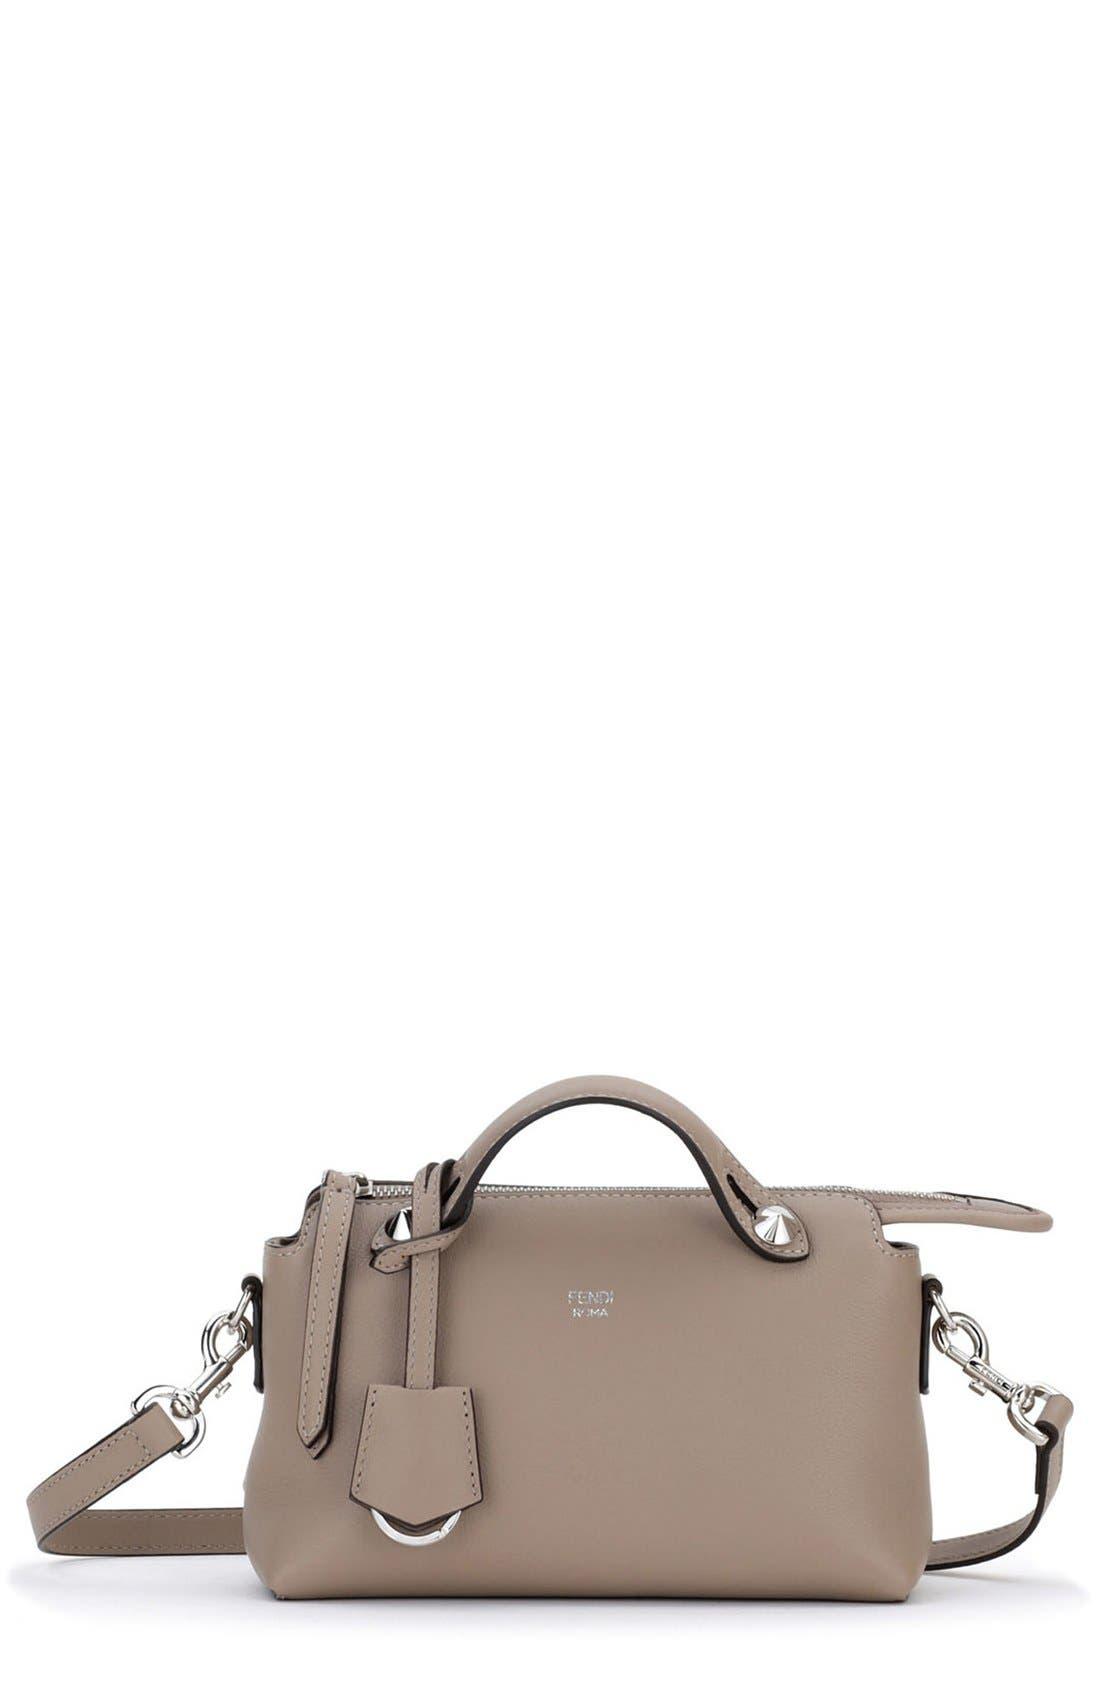 Main Image - Fendi 'Mini By the Way' Convertible Leather Crossbody Bag